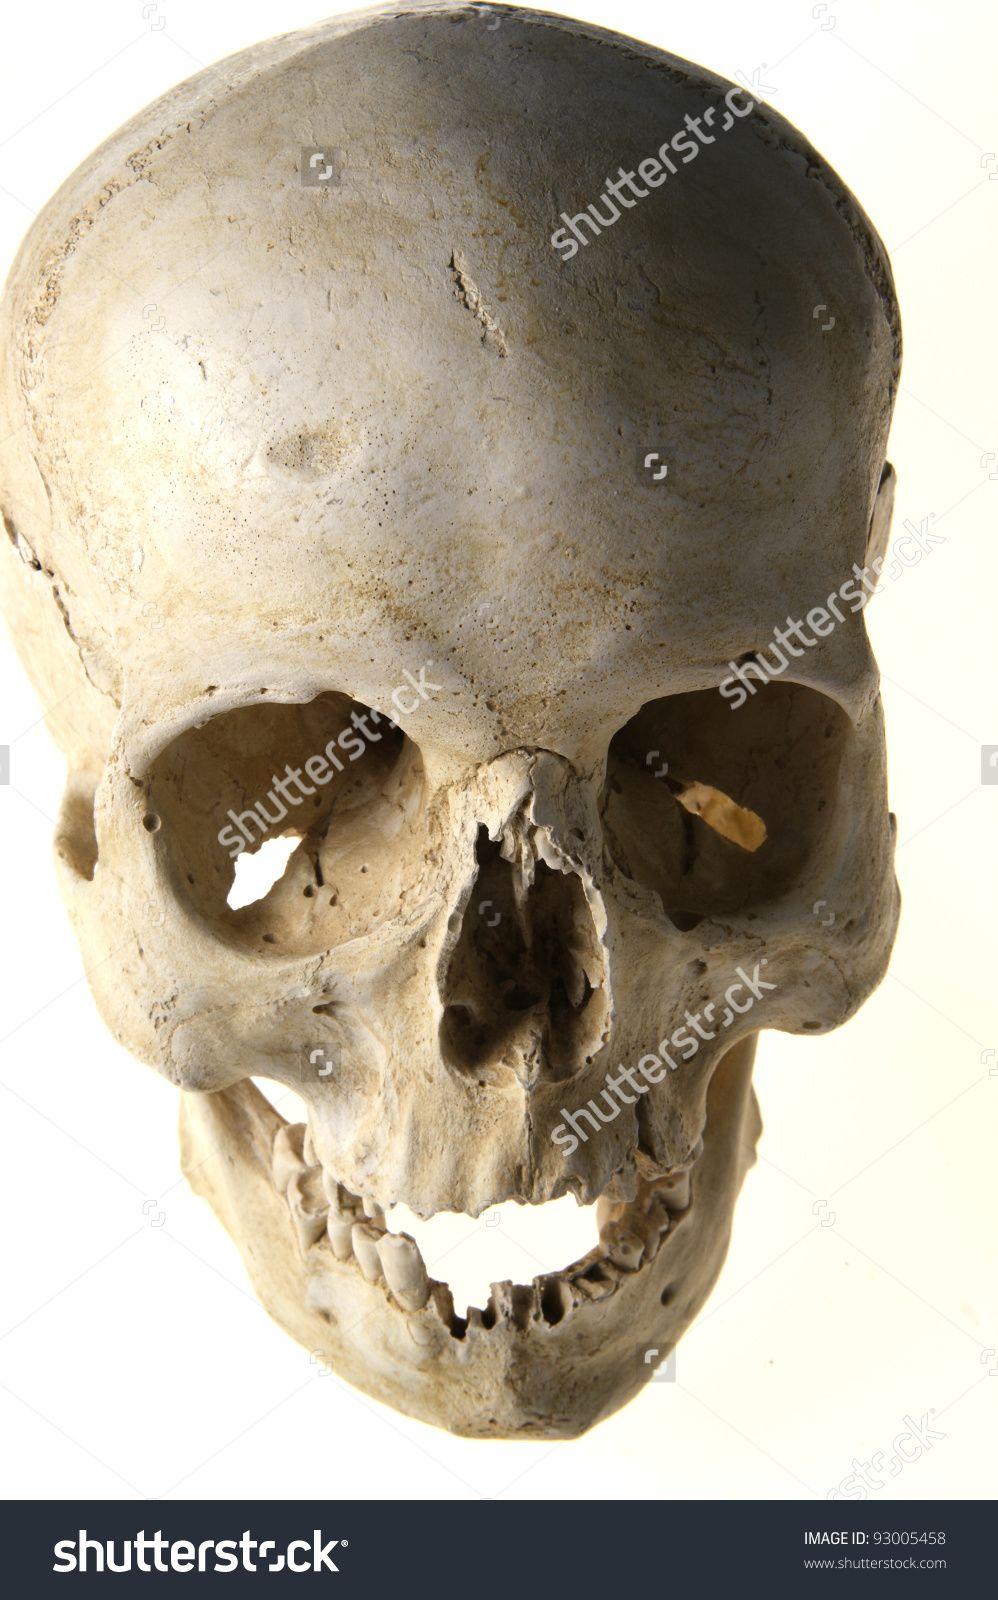 Human Anatomy Skull Стоковые фотографии 93005458 : Shutterstock ...